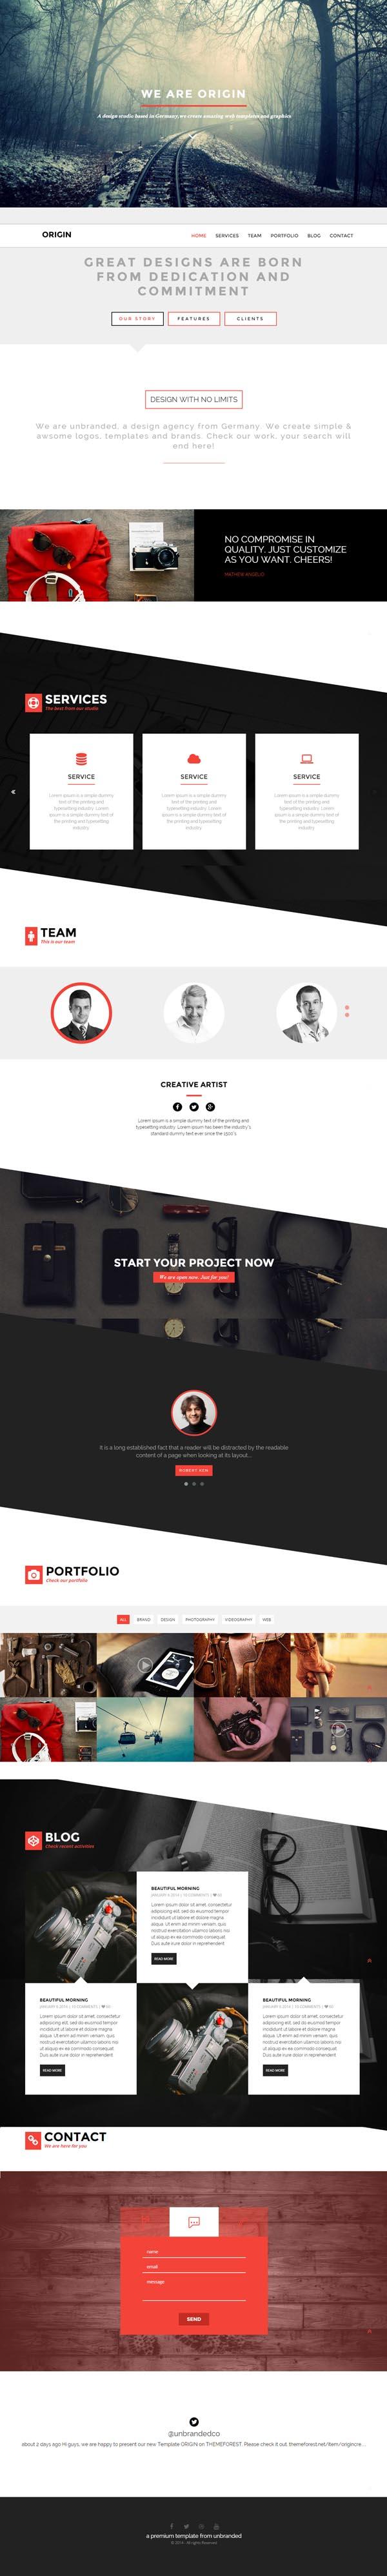 Origin-Creative One page HTML5 Template